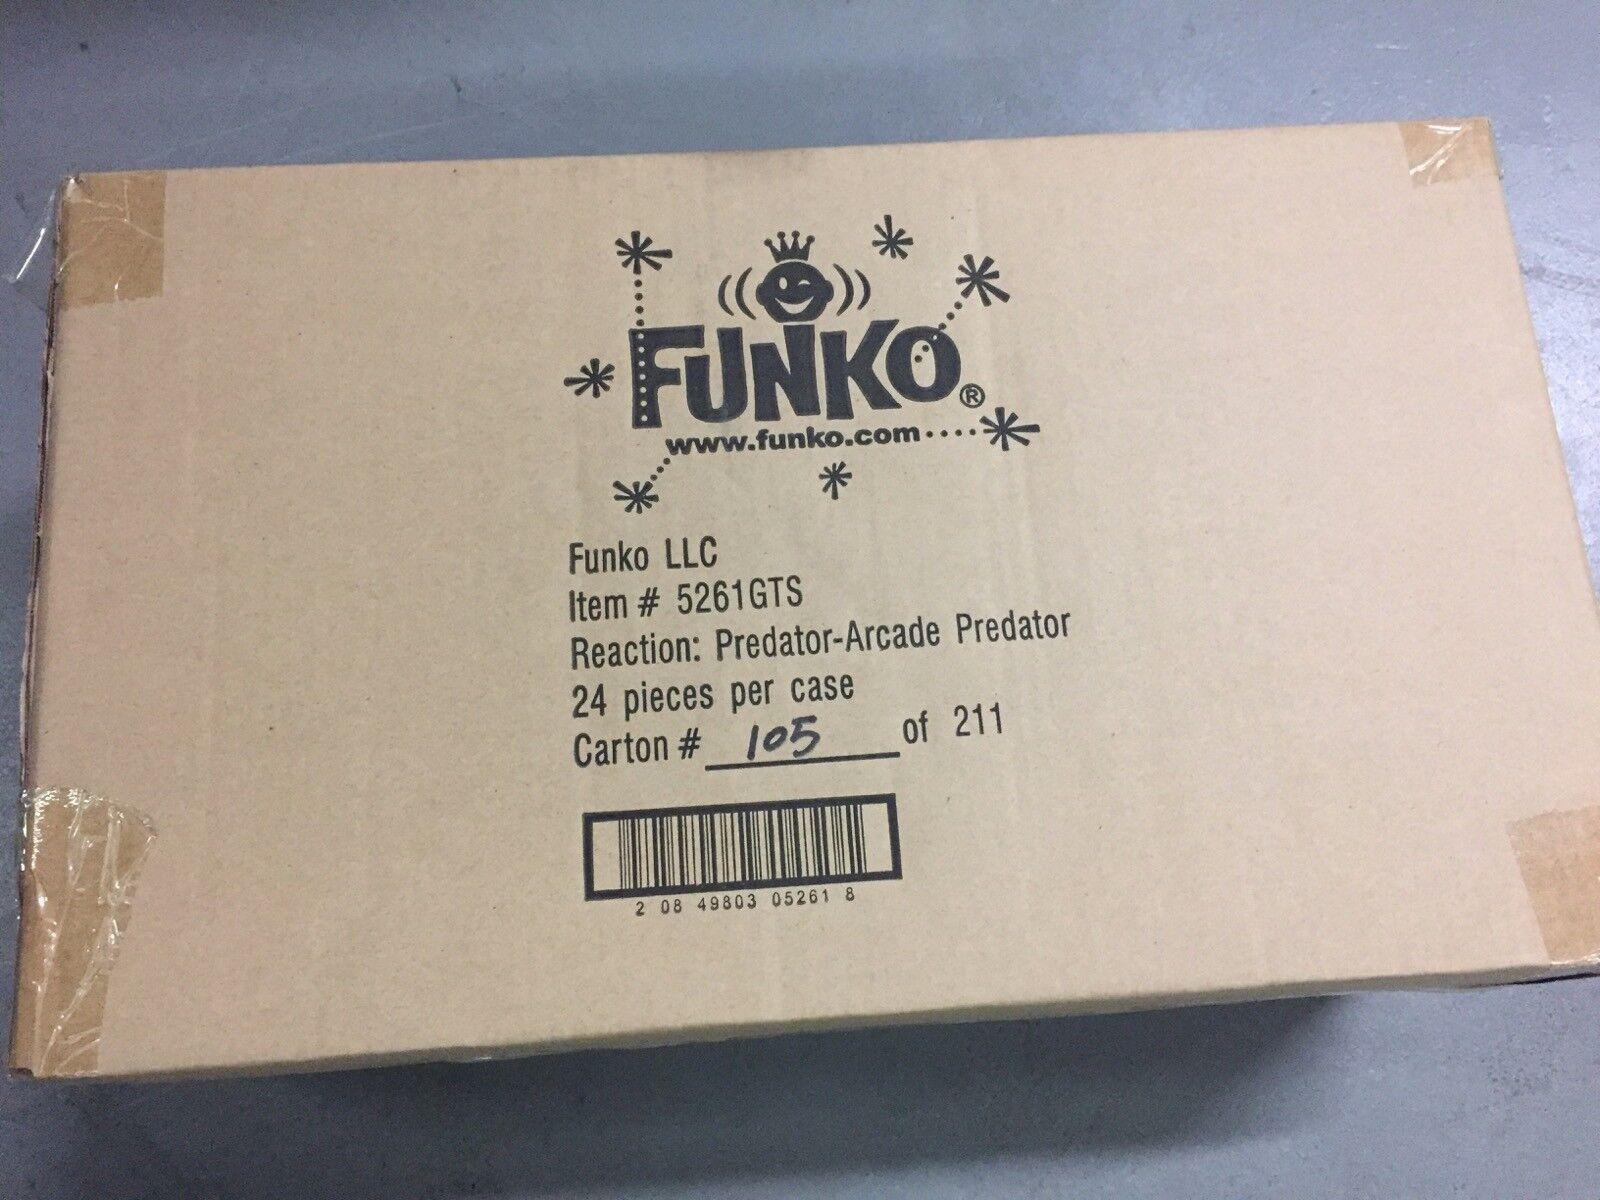 Funko reaktion abbildung arcade protator x 70 cm, 24 ct - fall